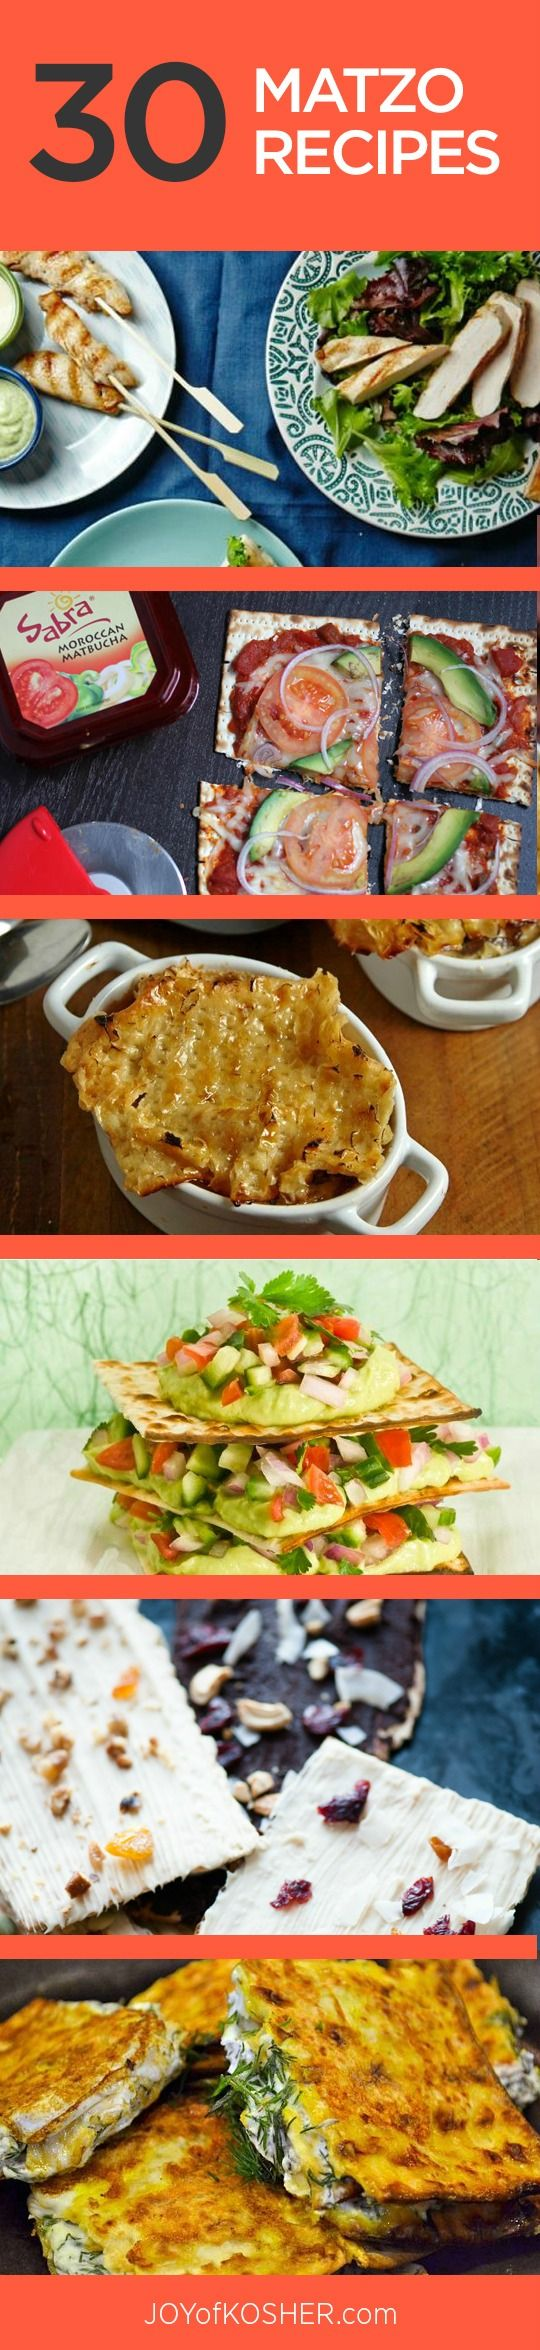 30 Matzo Recipes - What to do with lotsa matzo